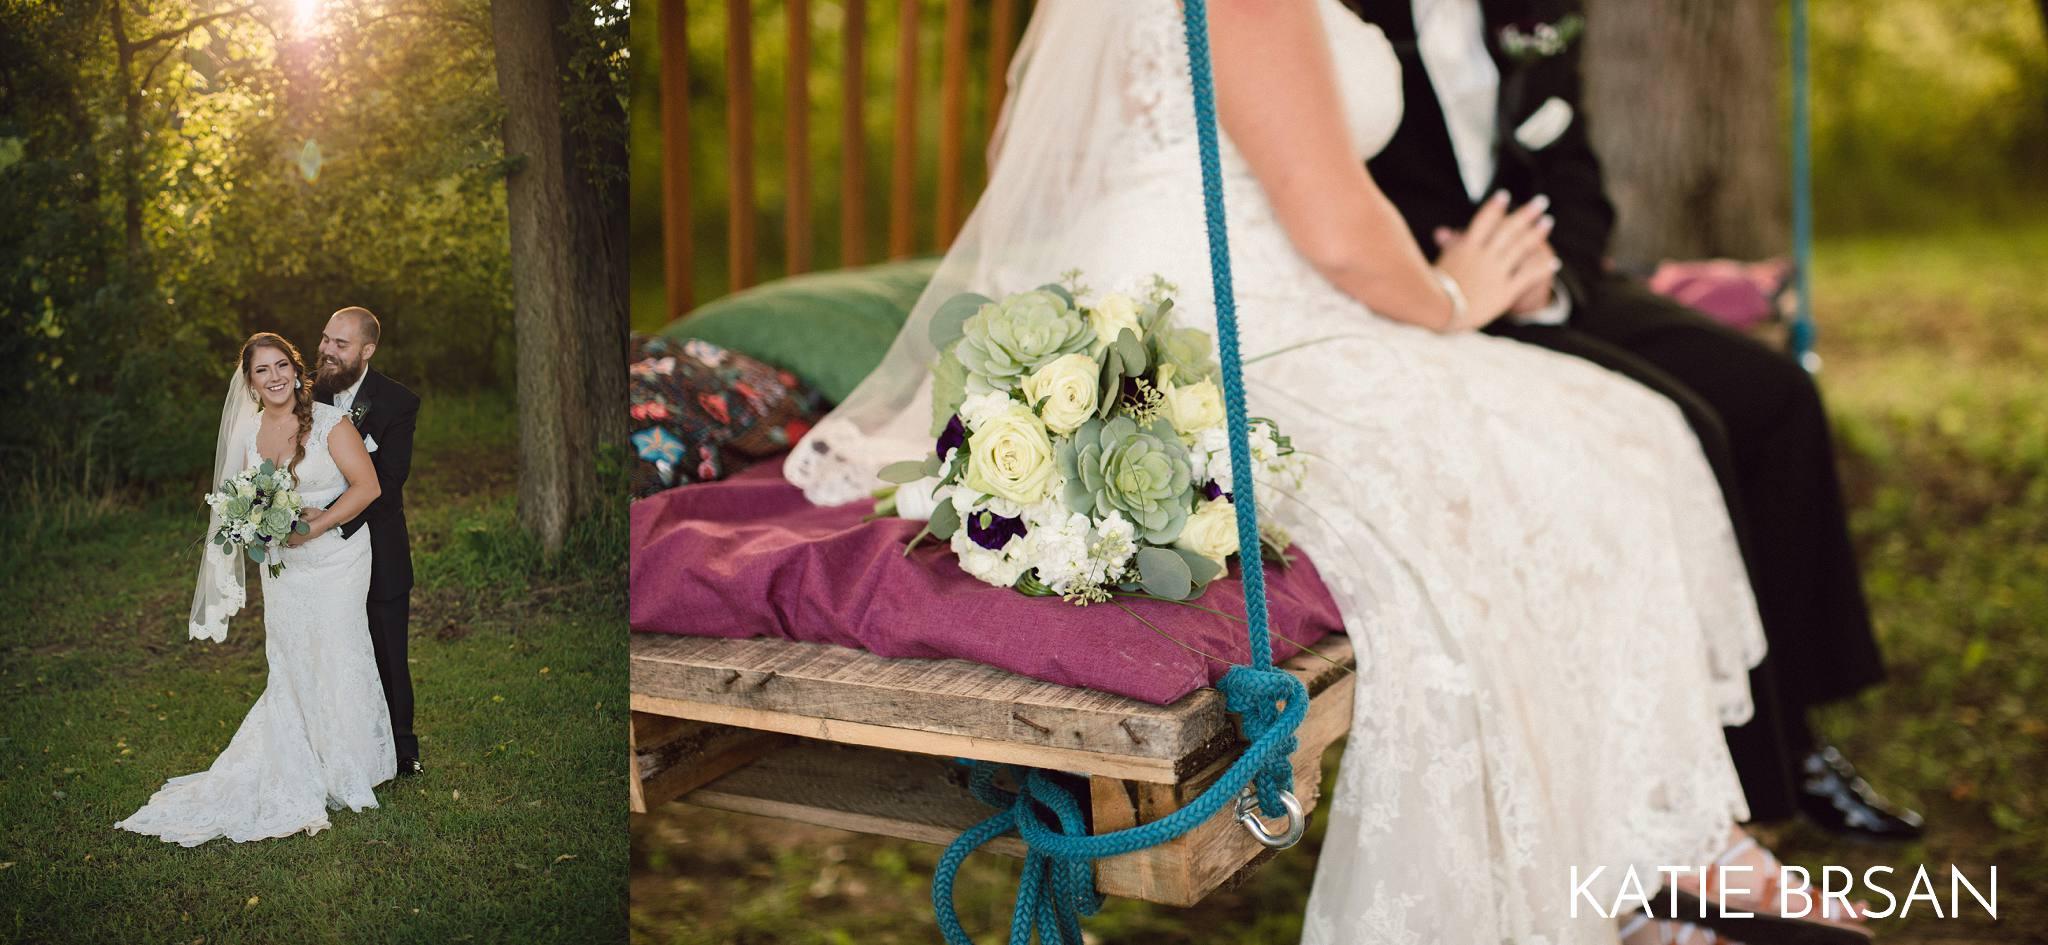 KatieBrsan-Bonfield-Backyard-Wedding_0419.jpg